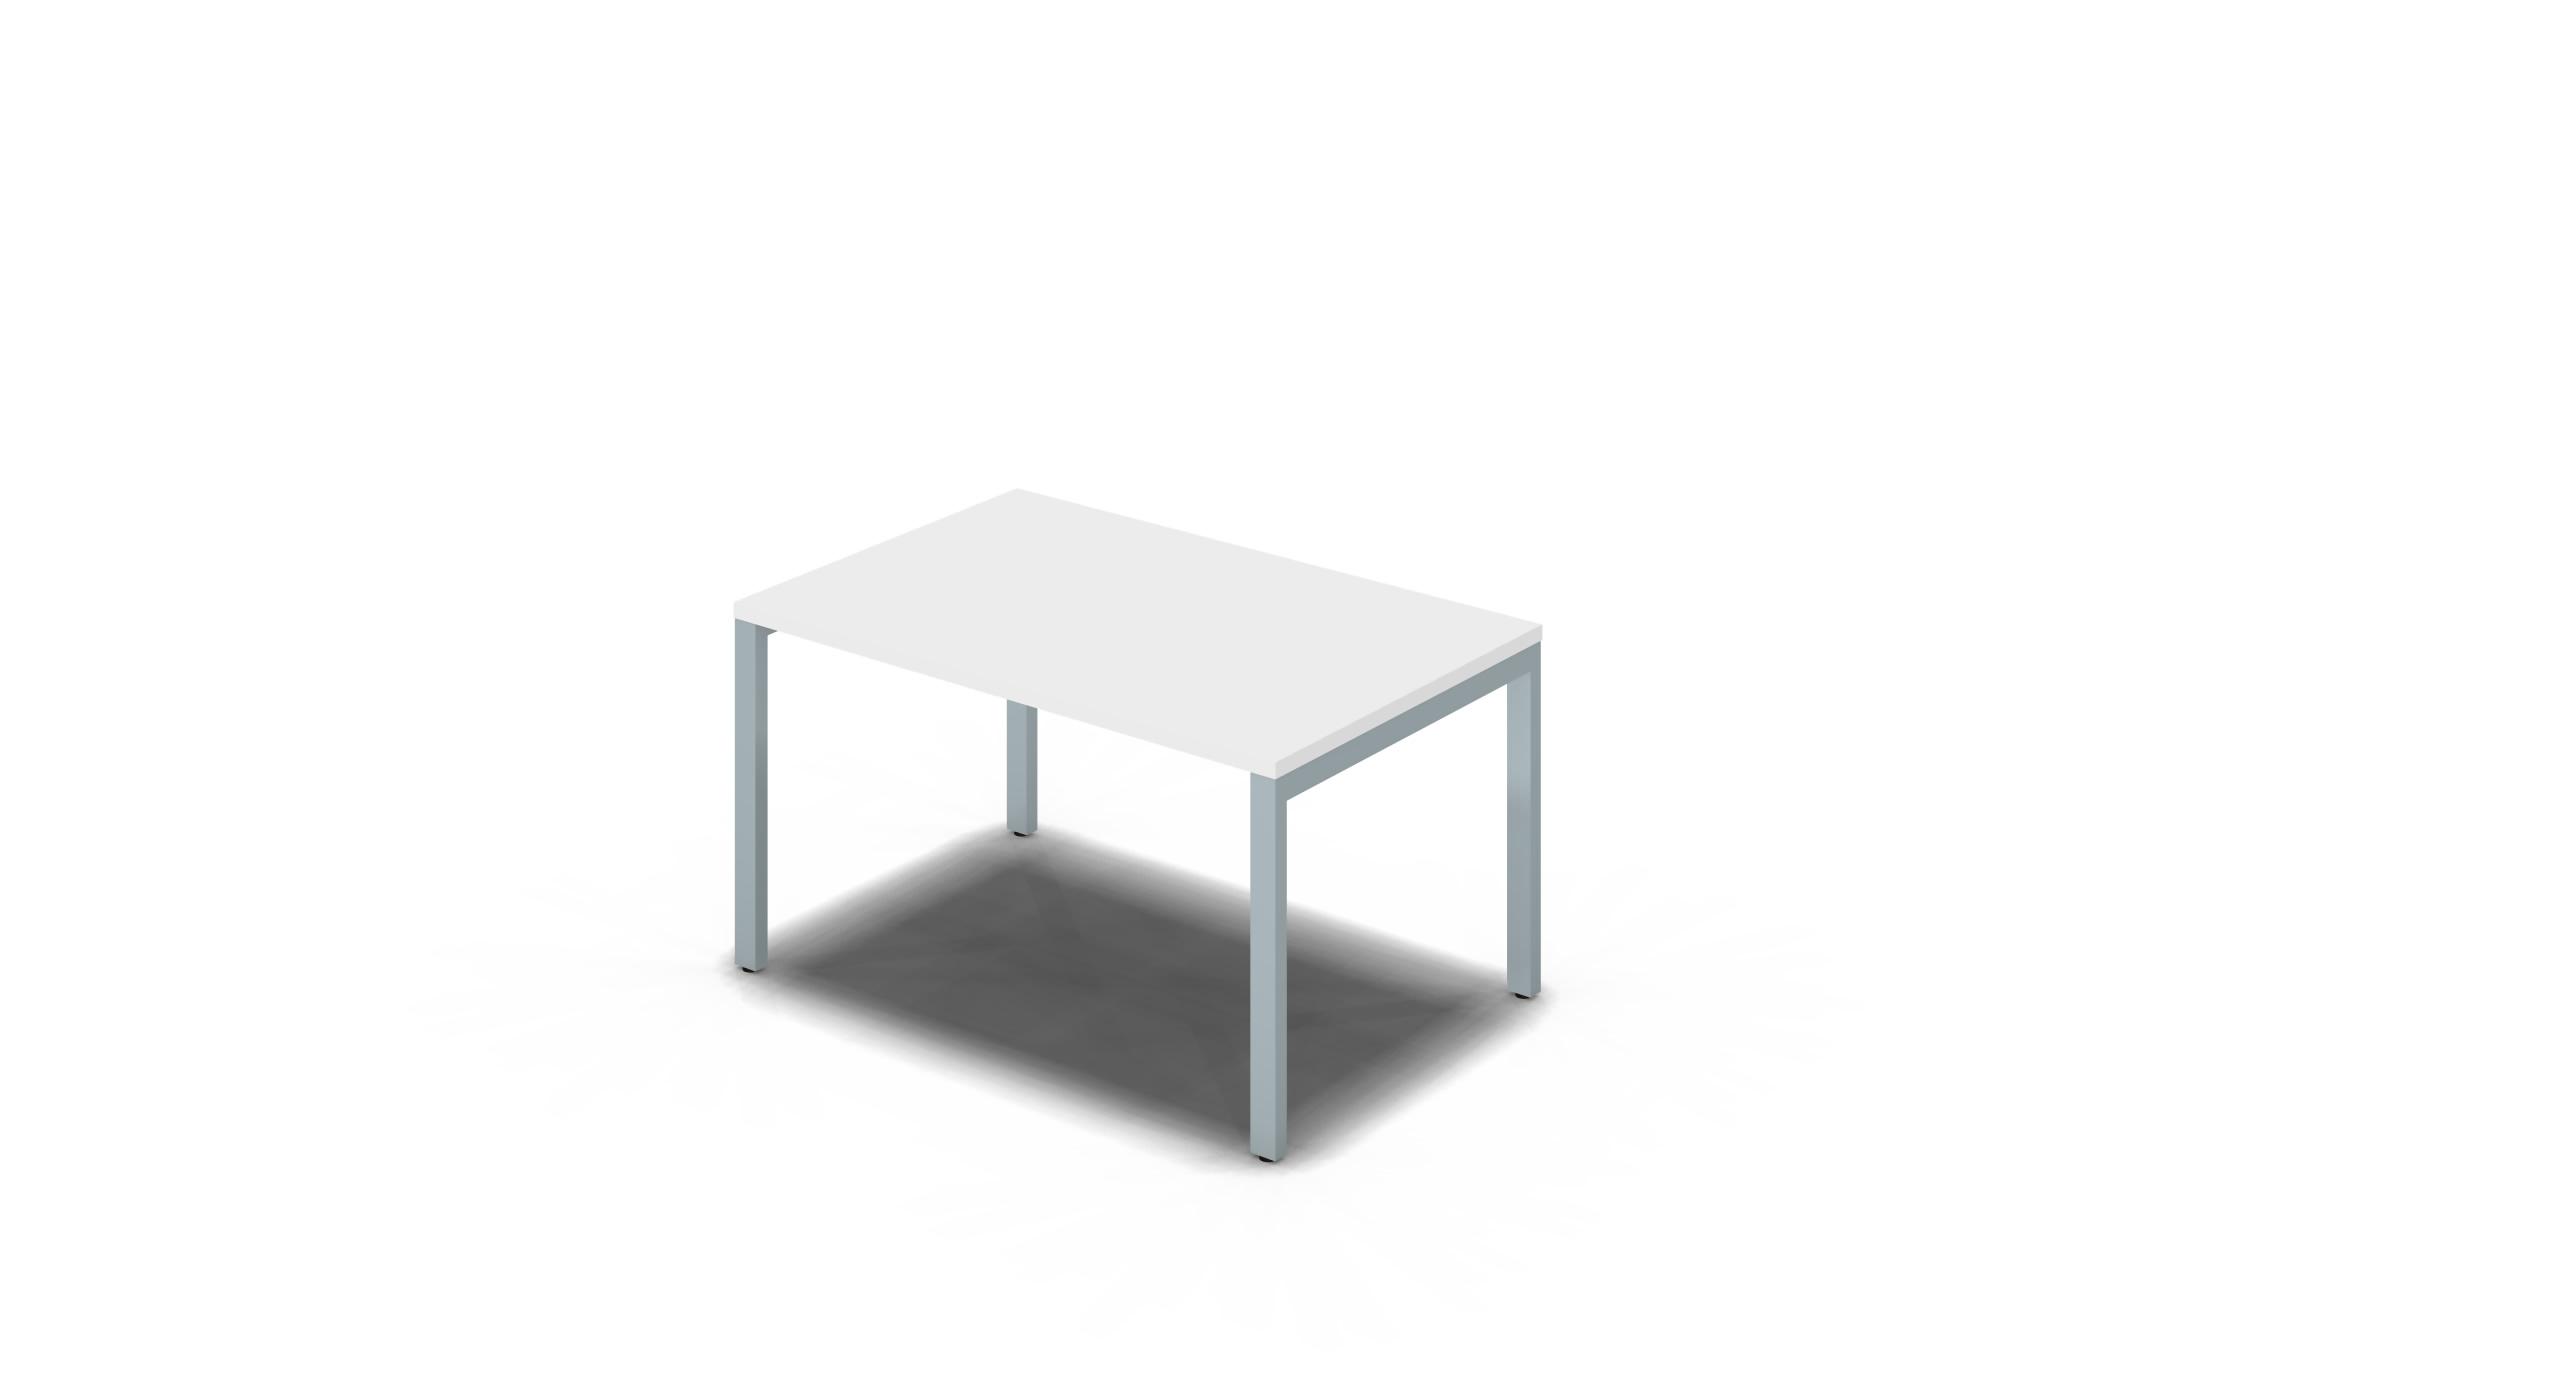 Table_Square_1200x750_Silver_White_noOption